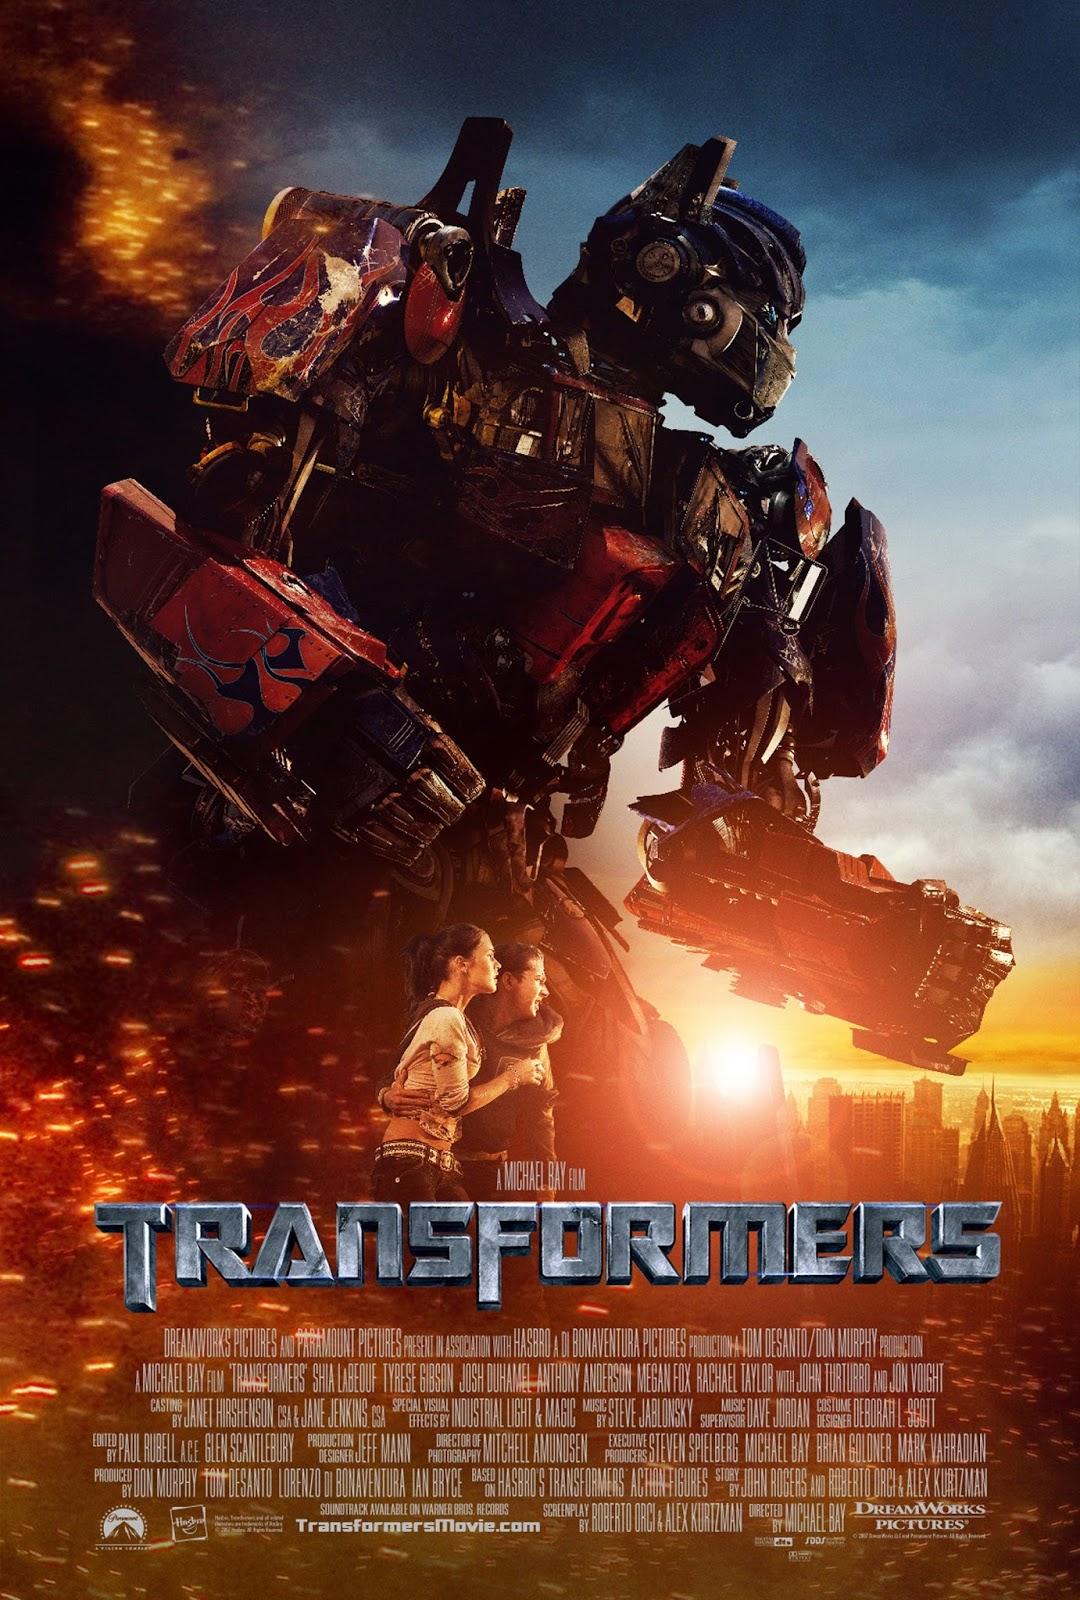 Transformers ทรานส์ฟอร์เมอร์ส มหาวิบัติเครื่องจักรกลถล่มโลก [HD][พากย์ไทย]